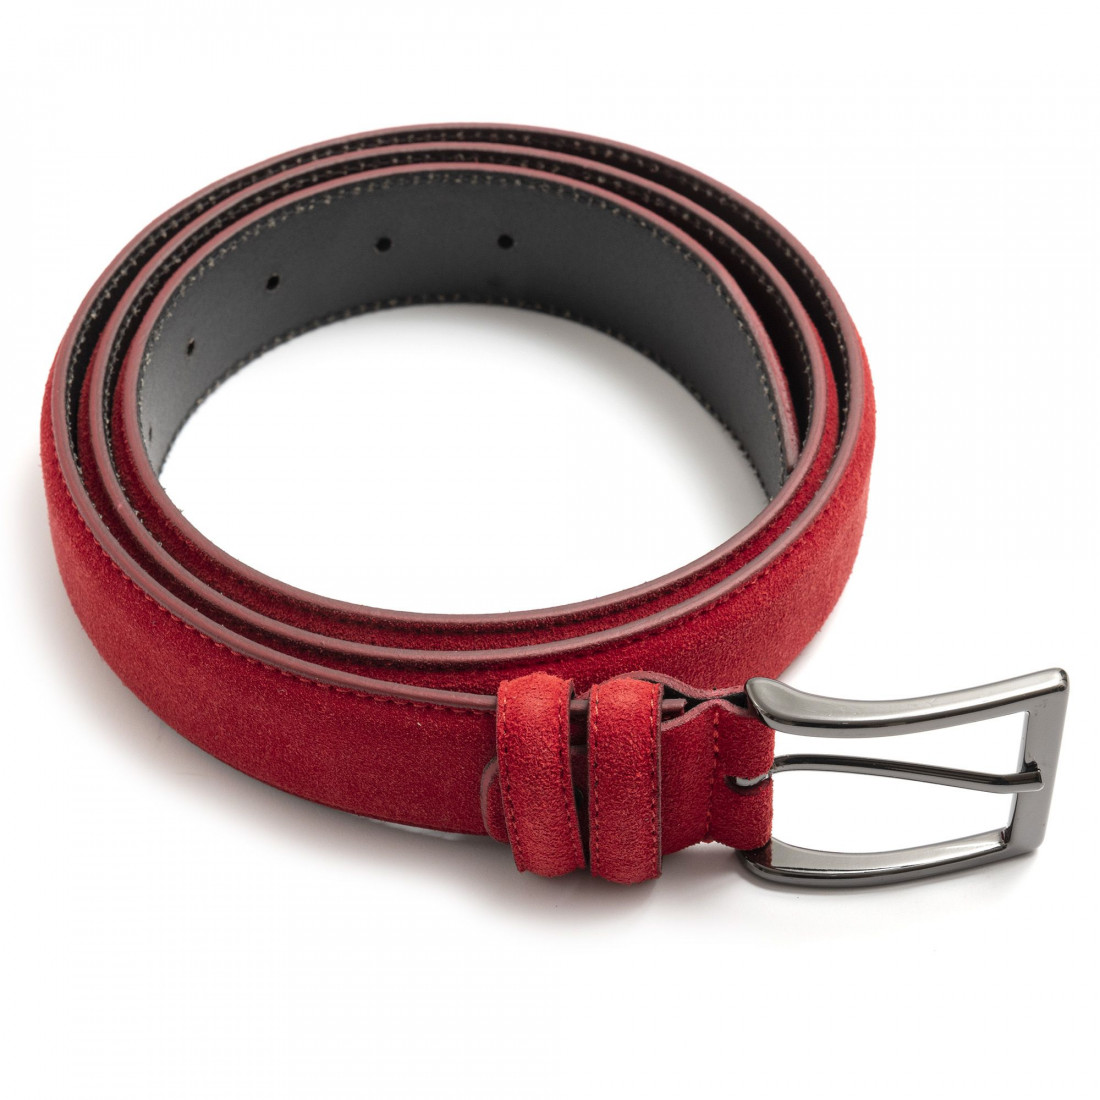 belts man sangiorgio 9009camoscio rosso 7422